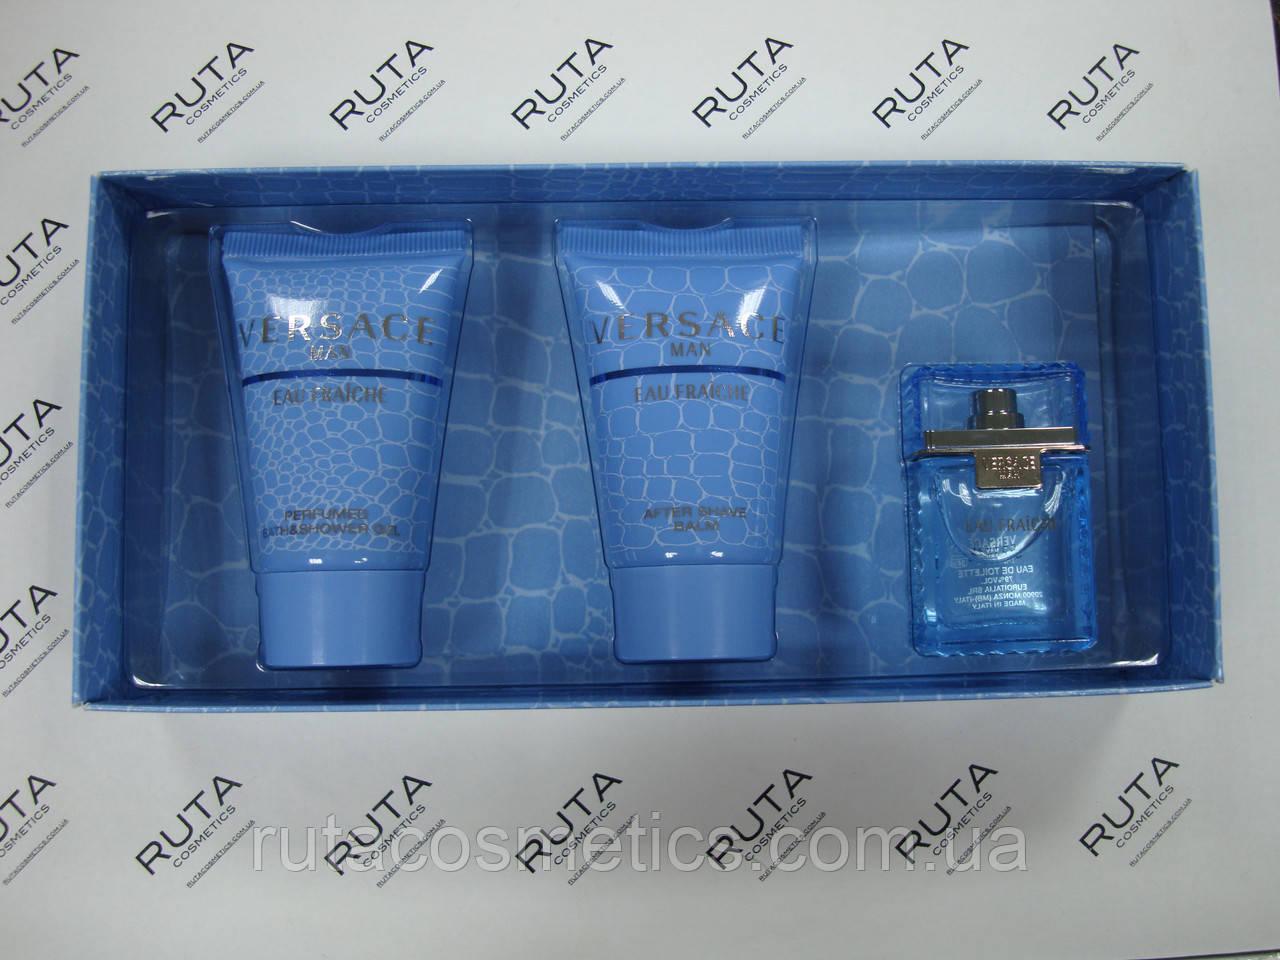 Versace Man Eau Fraiche парфюмированный набор